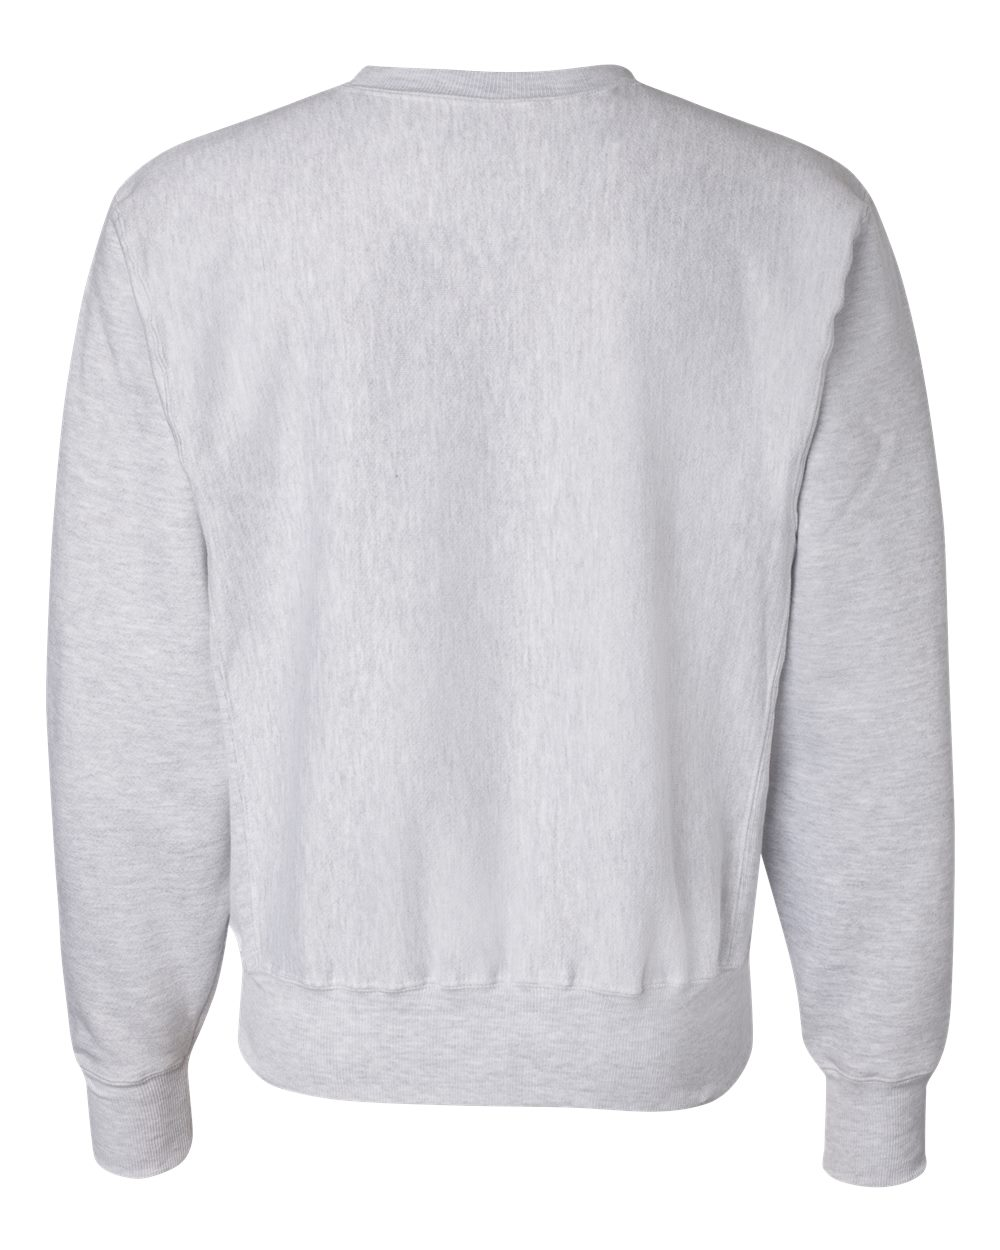 Champion-Mens-Reverse-Weave-Crewneck-Sweatshirt-Blank-Solid-S149-up-to-3XL thumbnail 16